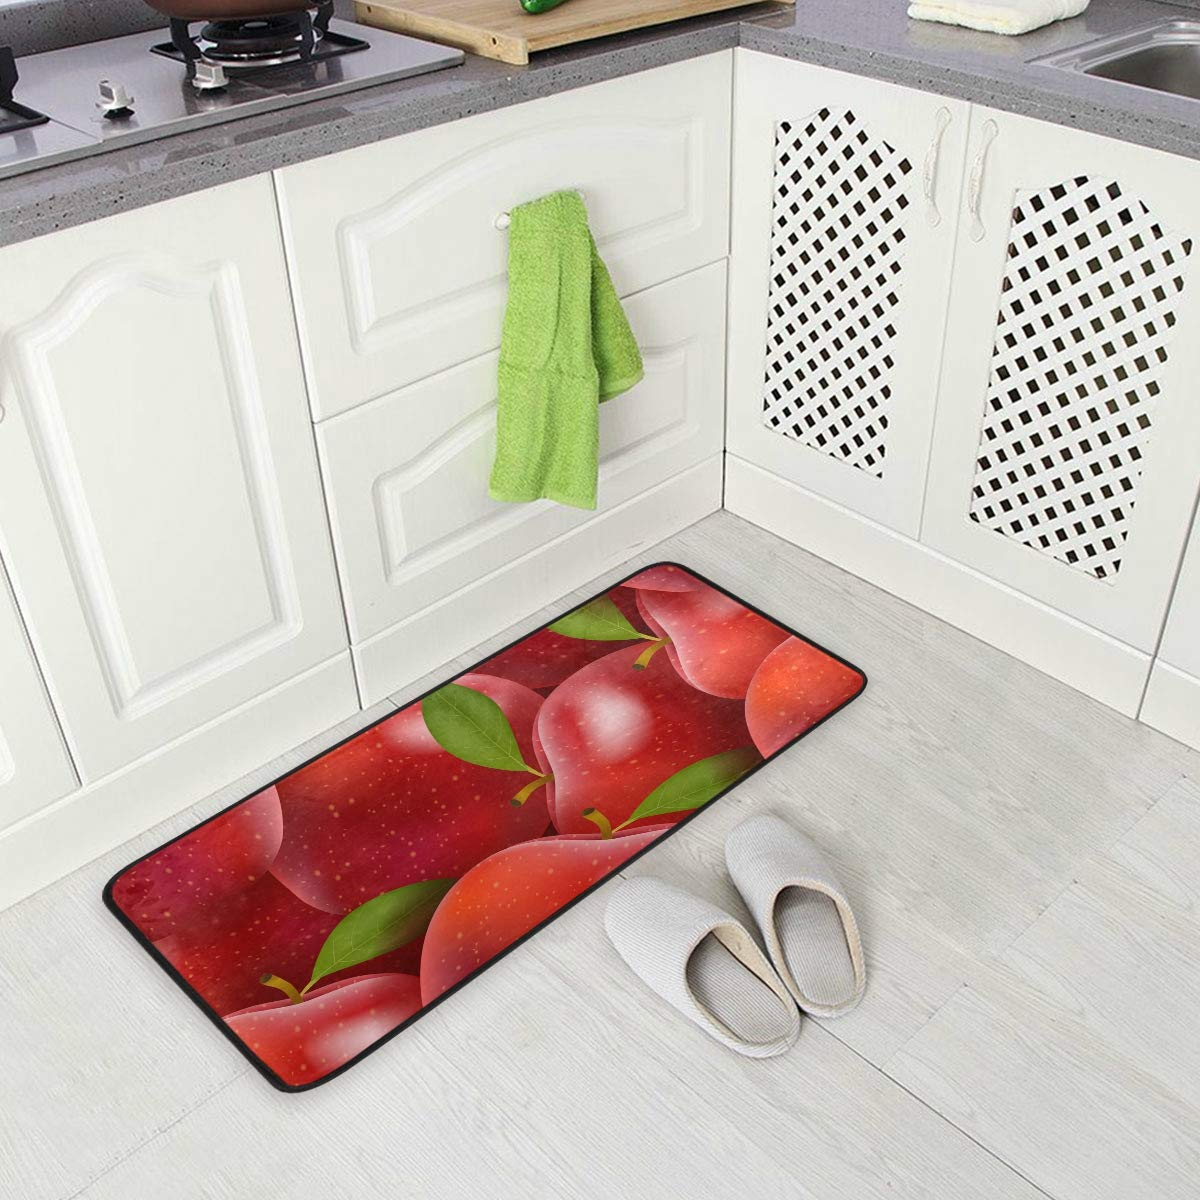 "Red Apple Fruit Pattern Kitchen Floor Mat, Non-Slip Comfort Office Standing Cushioned Rug Home Decor Indoor Outdoor, 39"" x 20"""